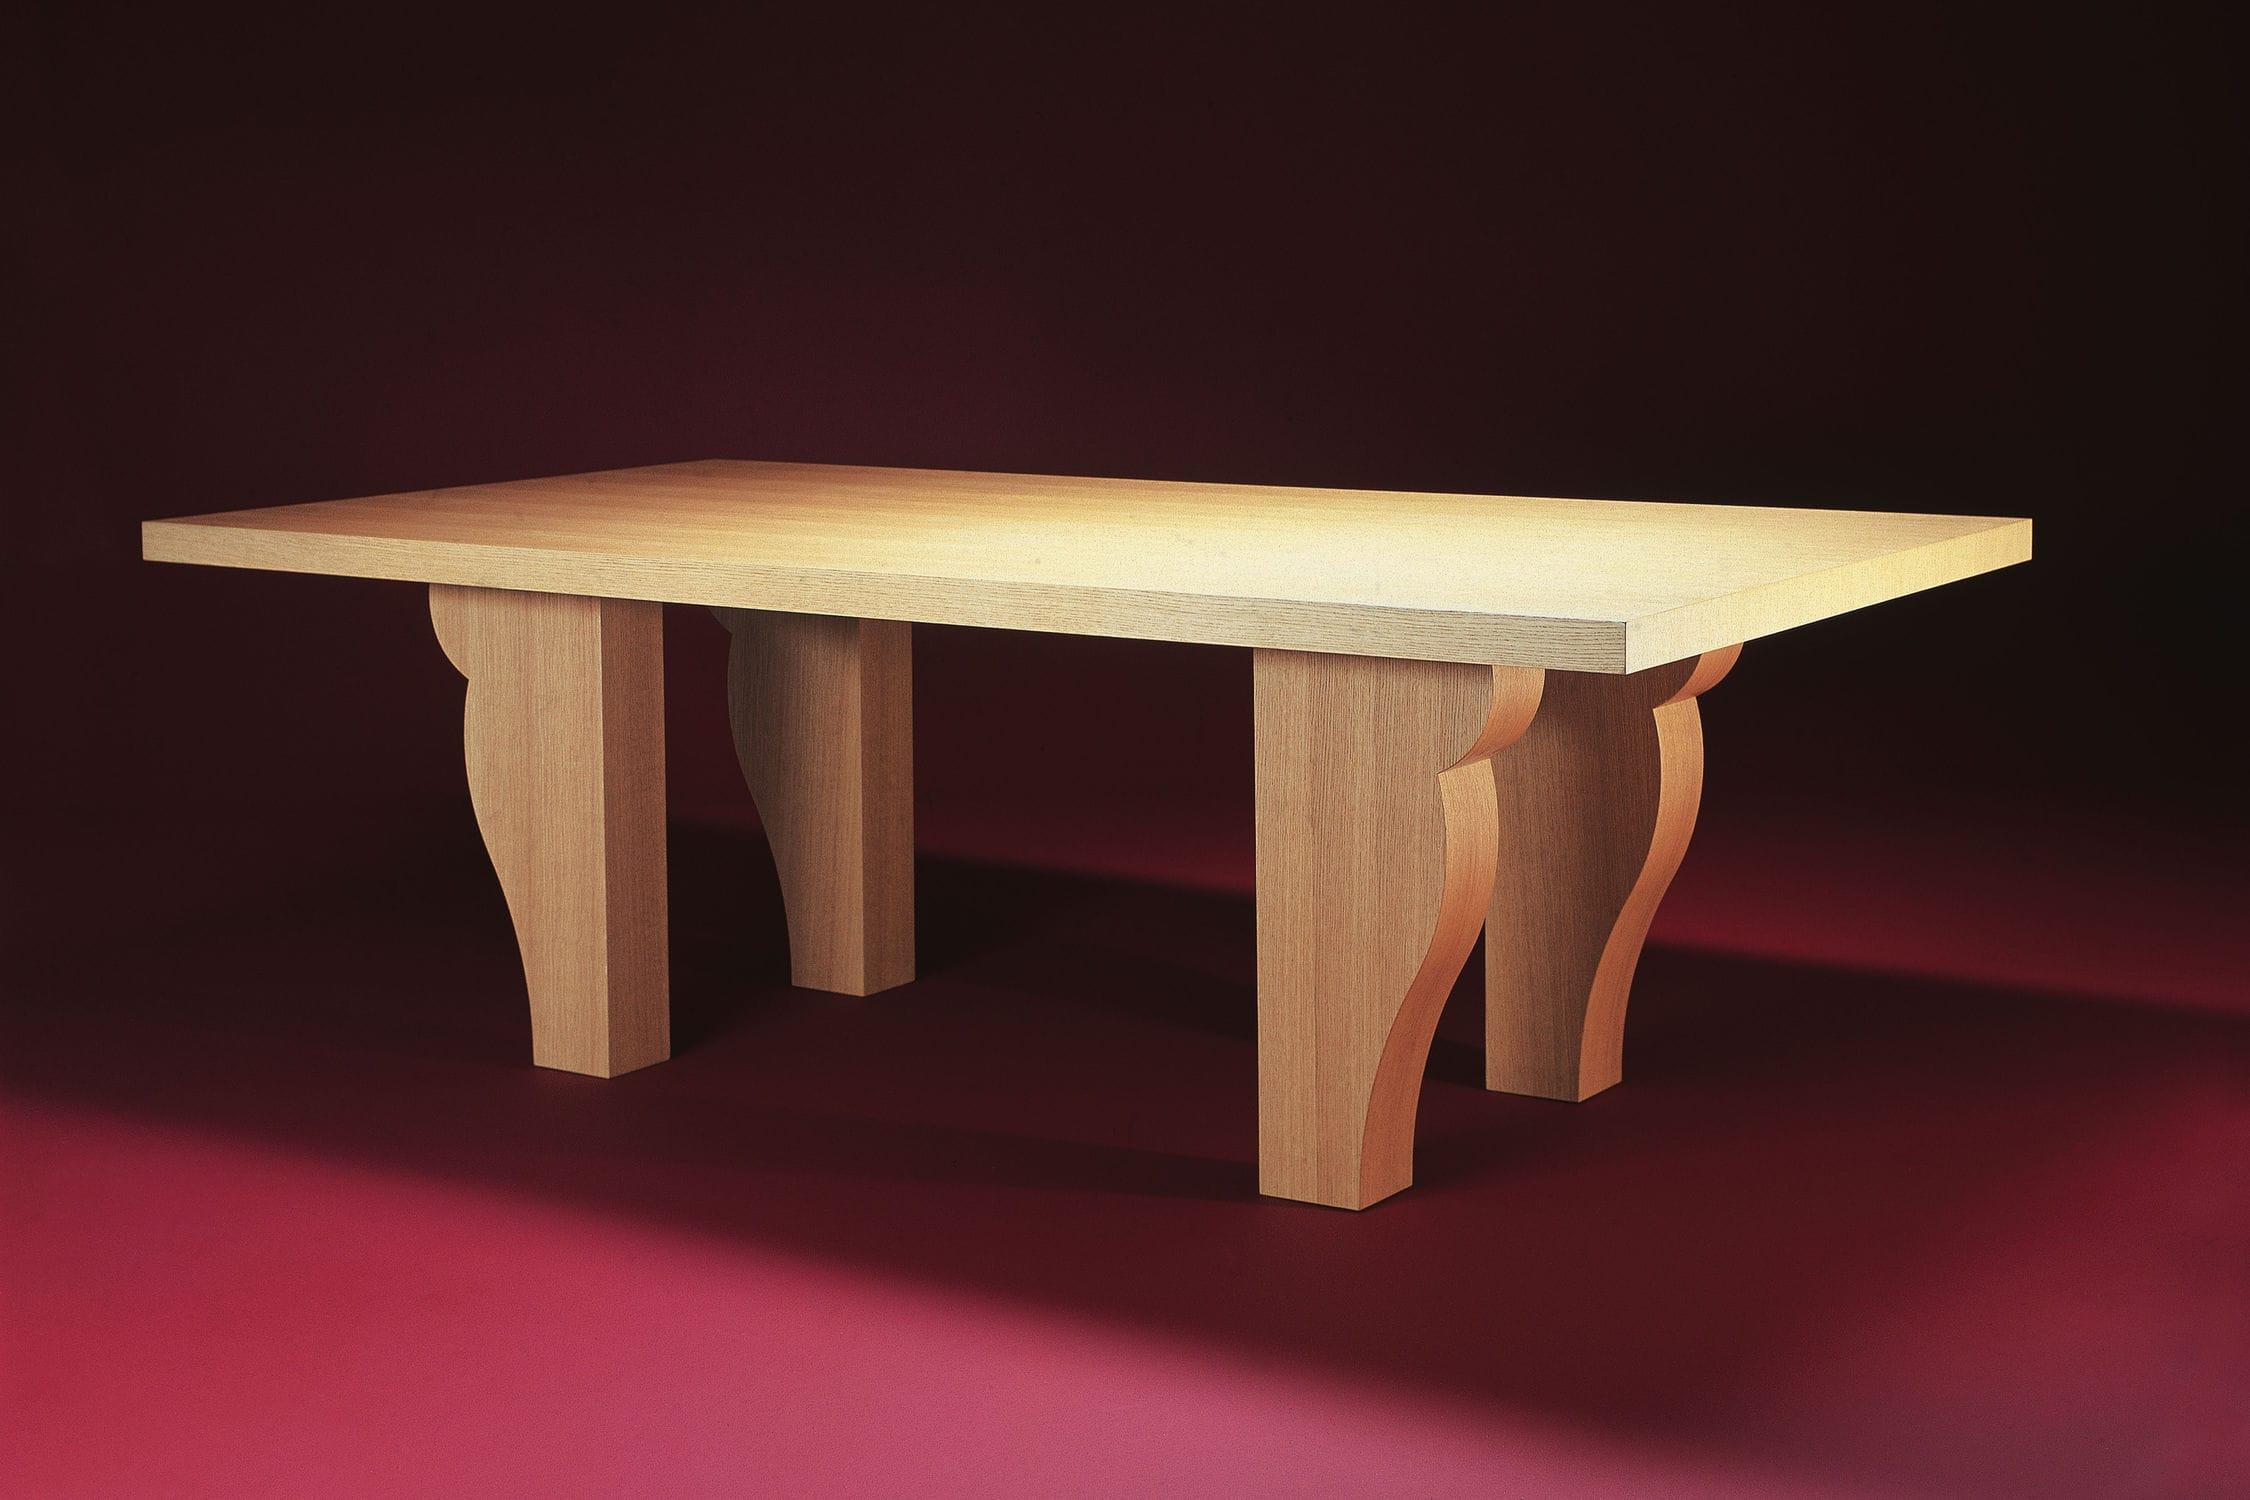 Tavolo Pranzo Art Deco tavolo da pranzo art deco - 1935 - ecart international - in